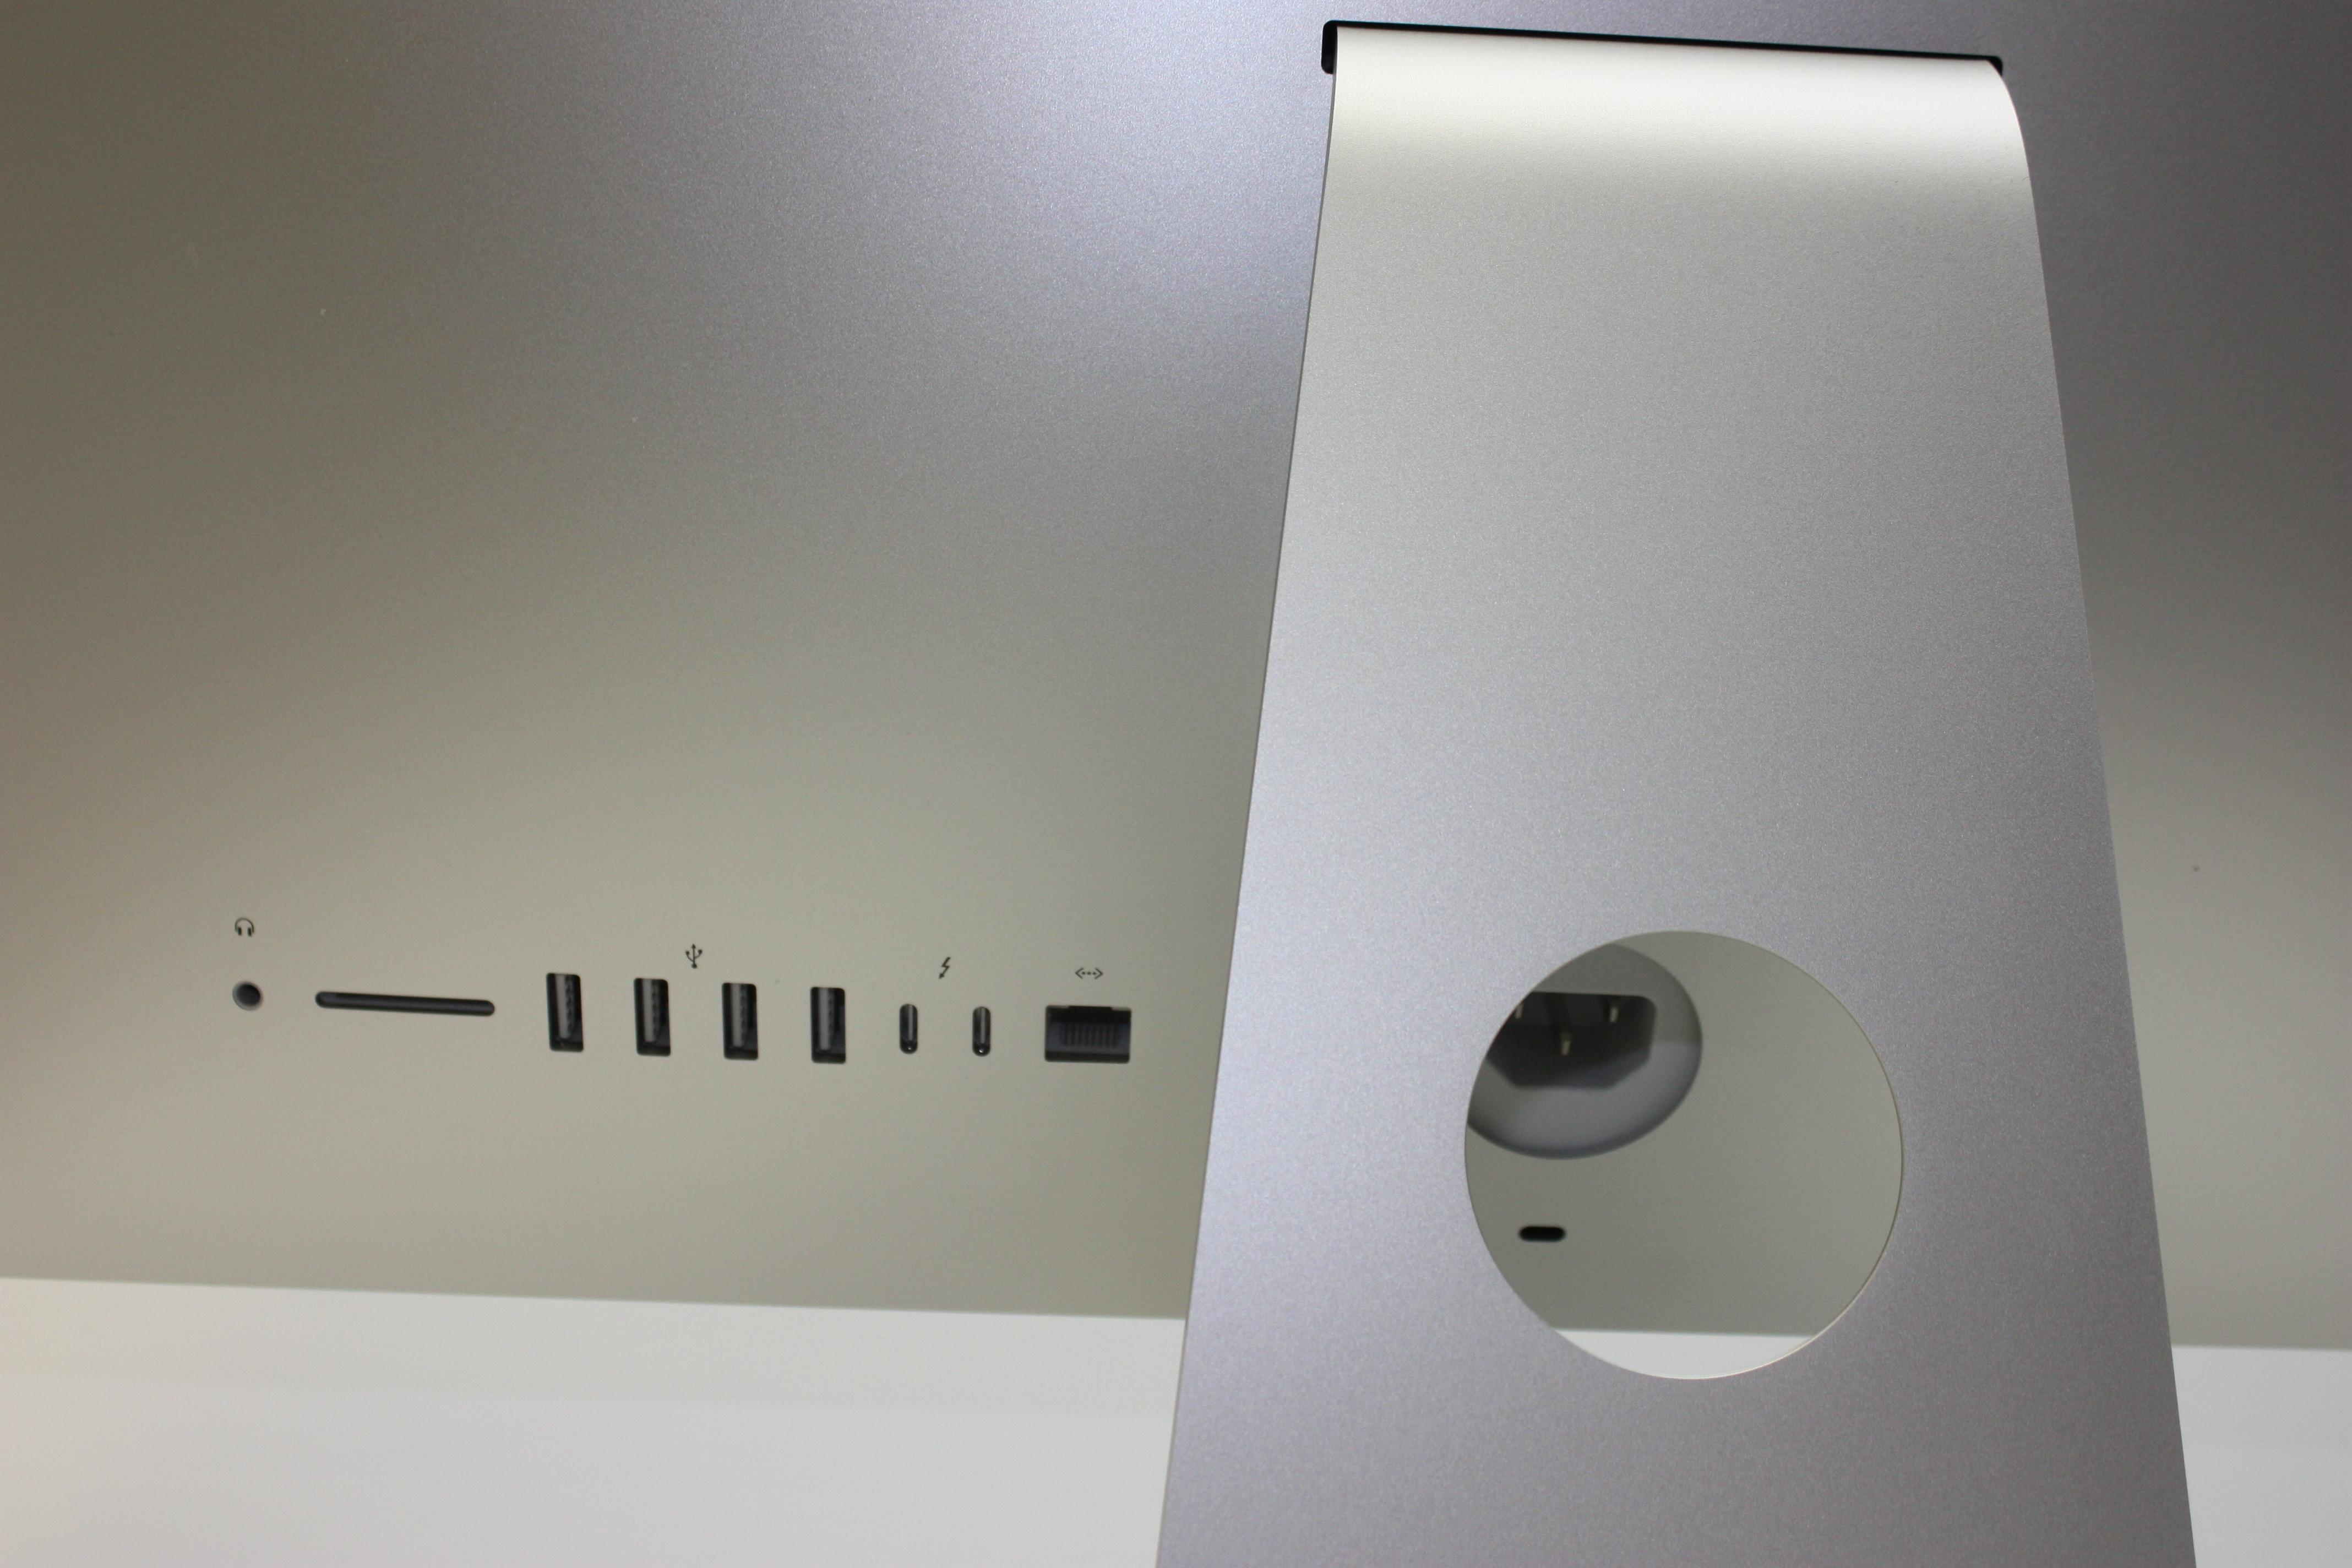 iMac Retina 4K 21.5-inch, 3.0 GHz Core i5, 8 GB 2400 MHz DDR4, 1 TB SATA Disk, image 6